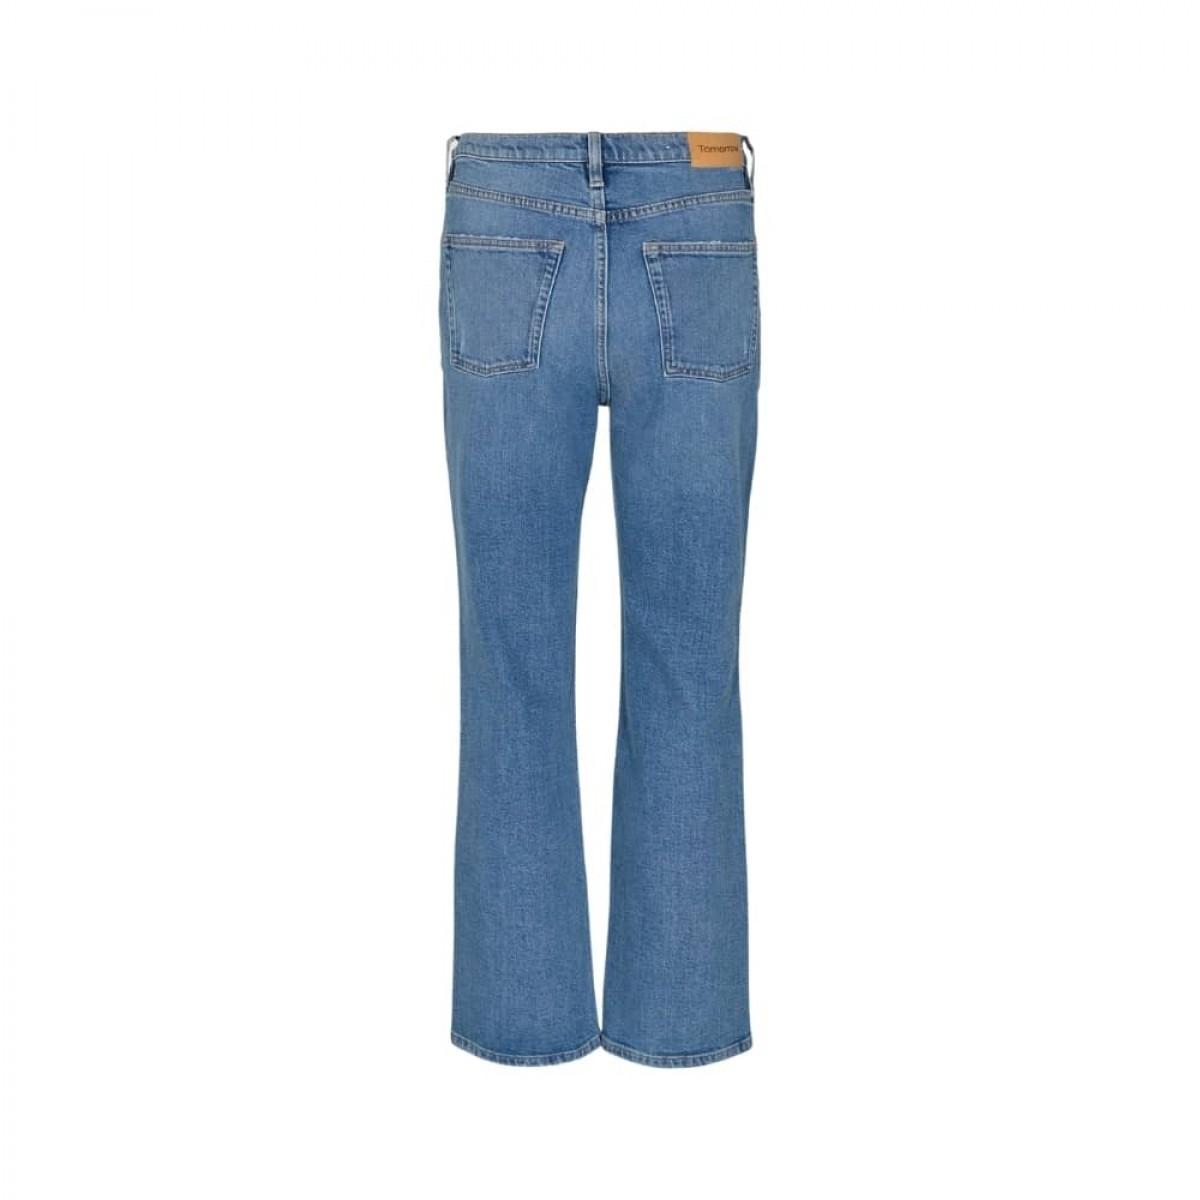 marston jeans - denim blue - bagtil